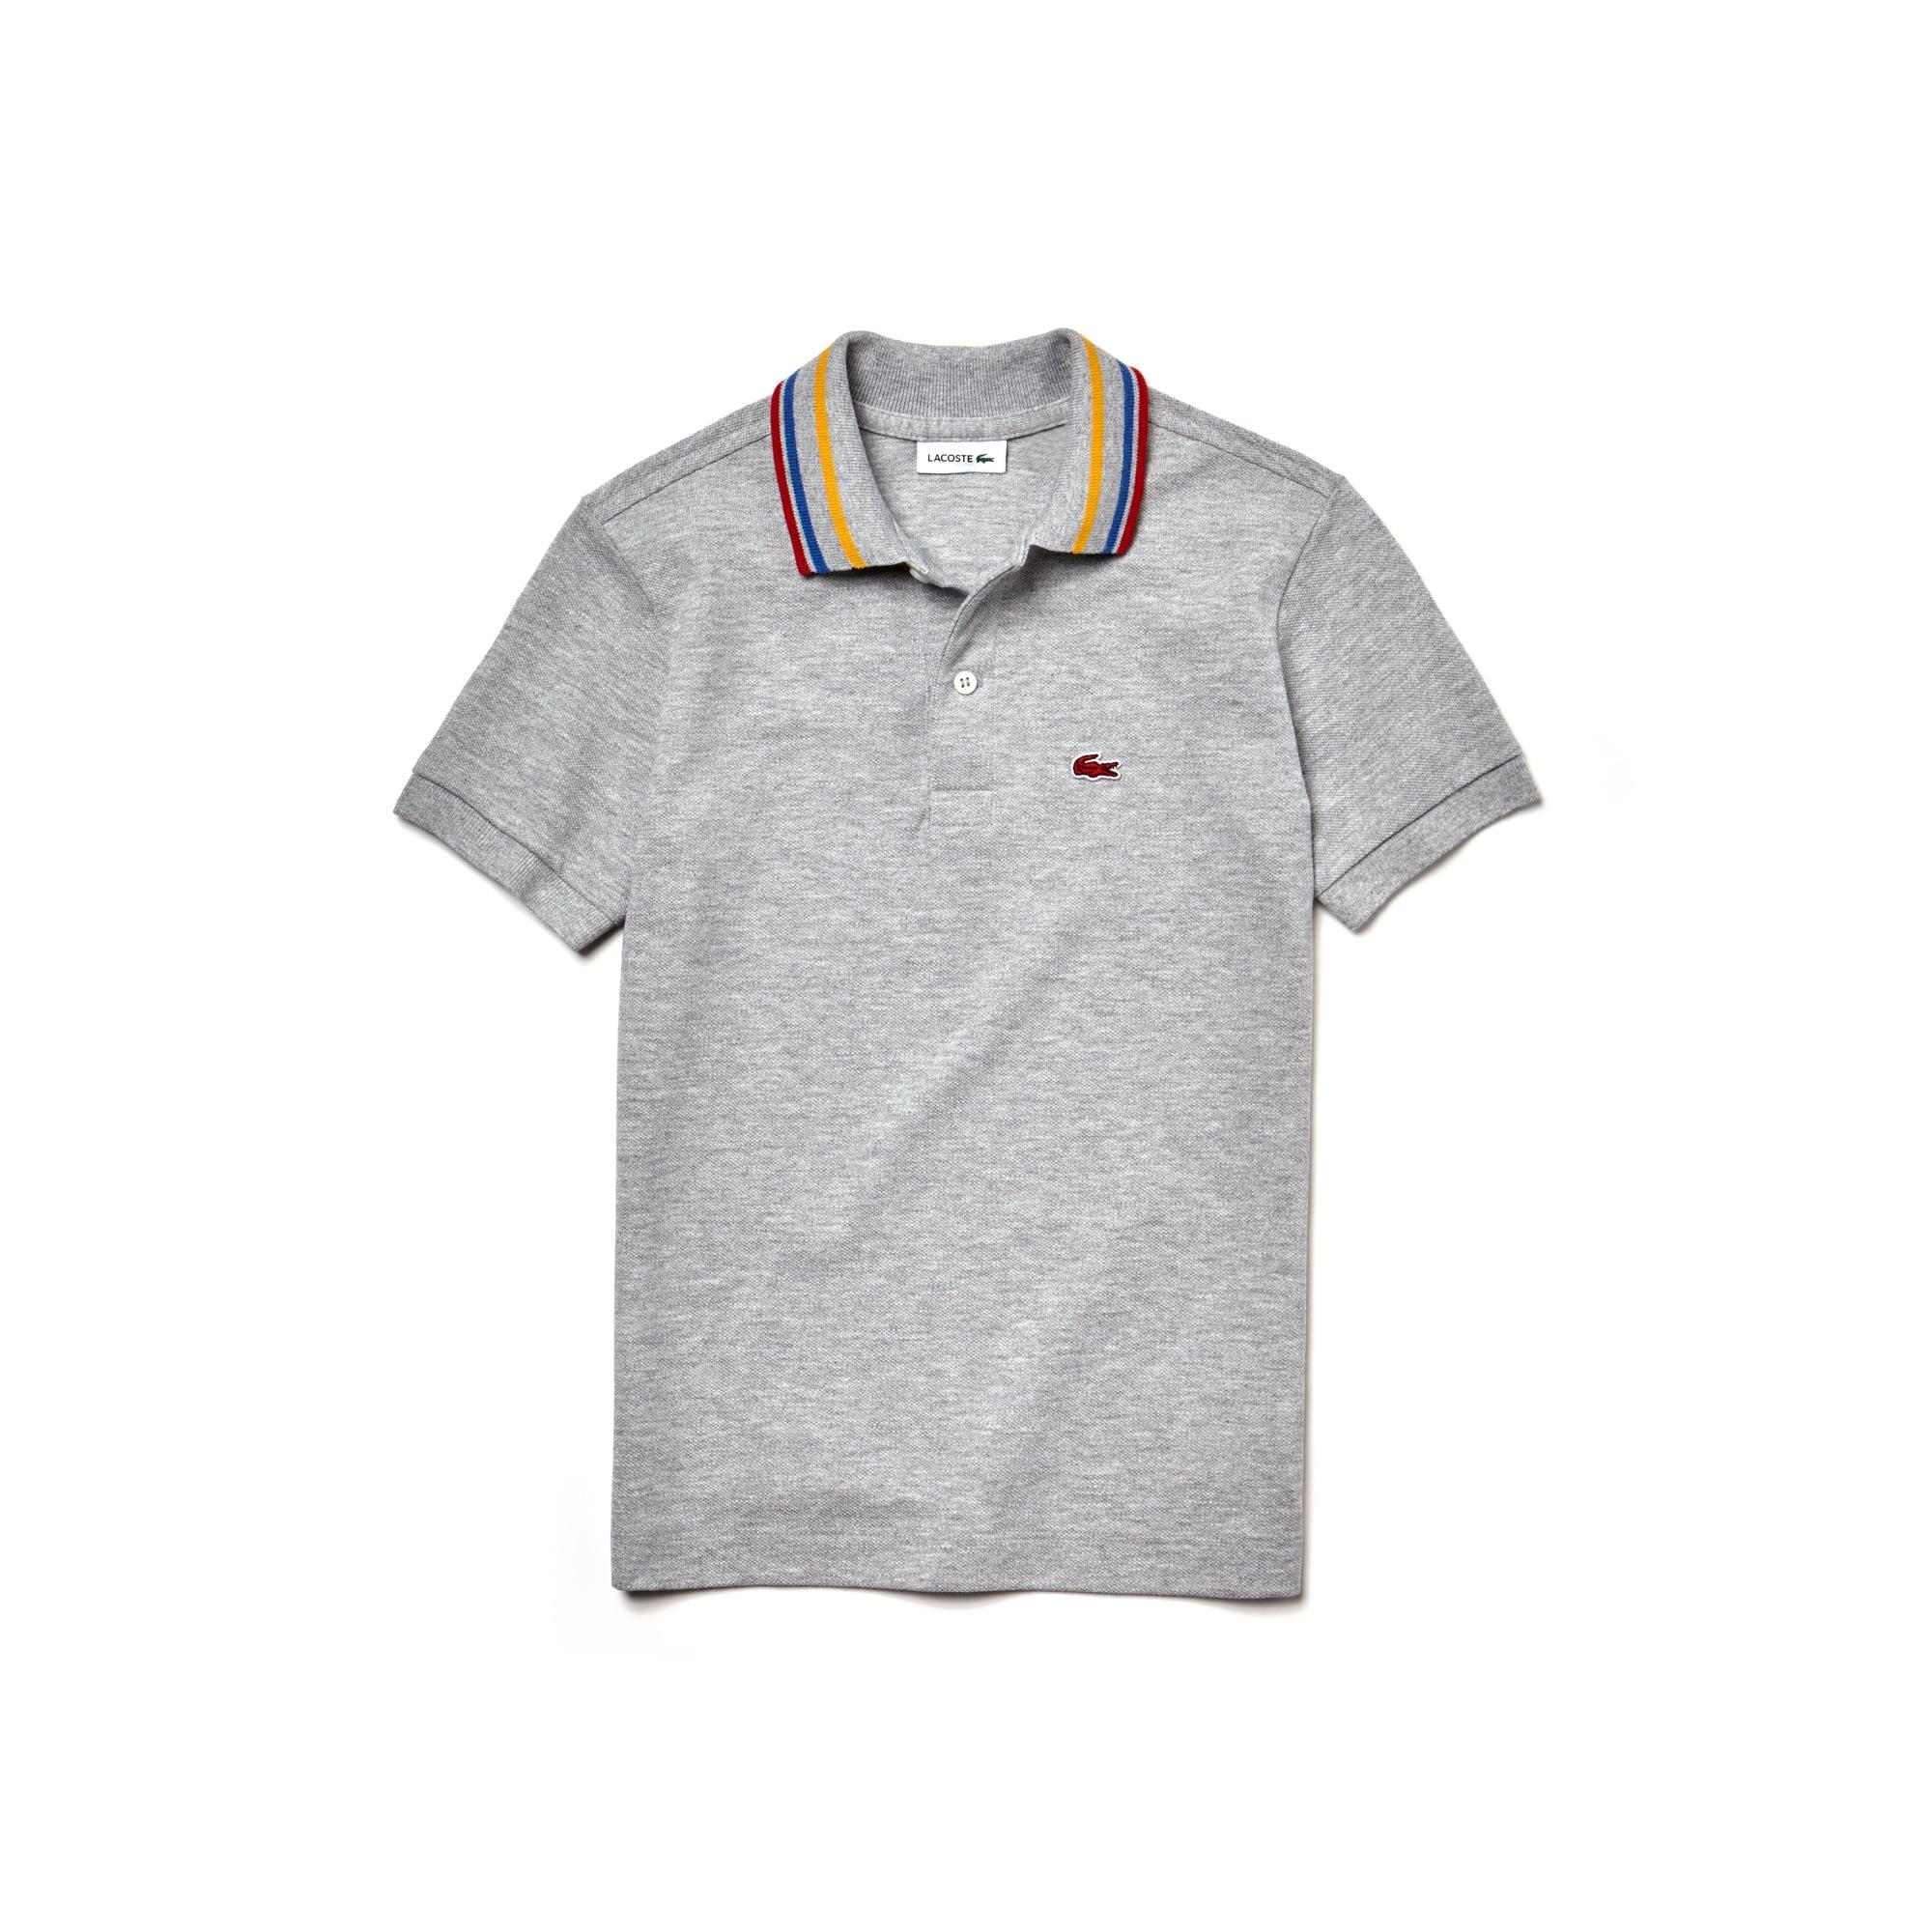 Boys' Lacoste Striped Neck Petit Piqué Polo Shirt